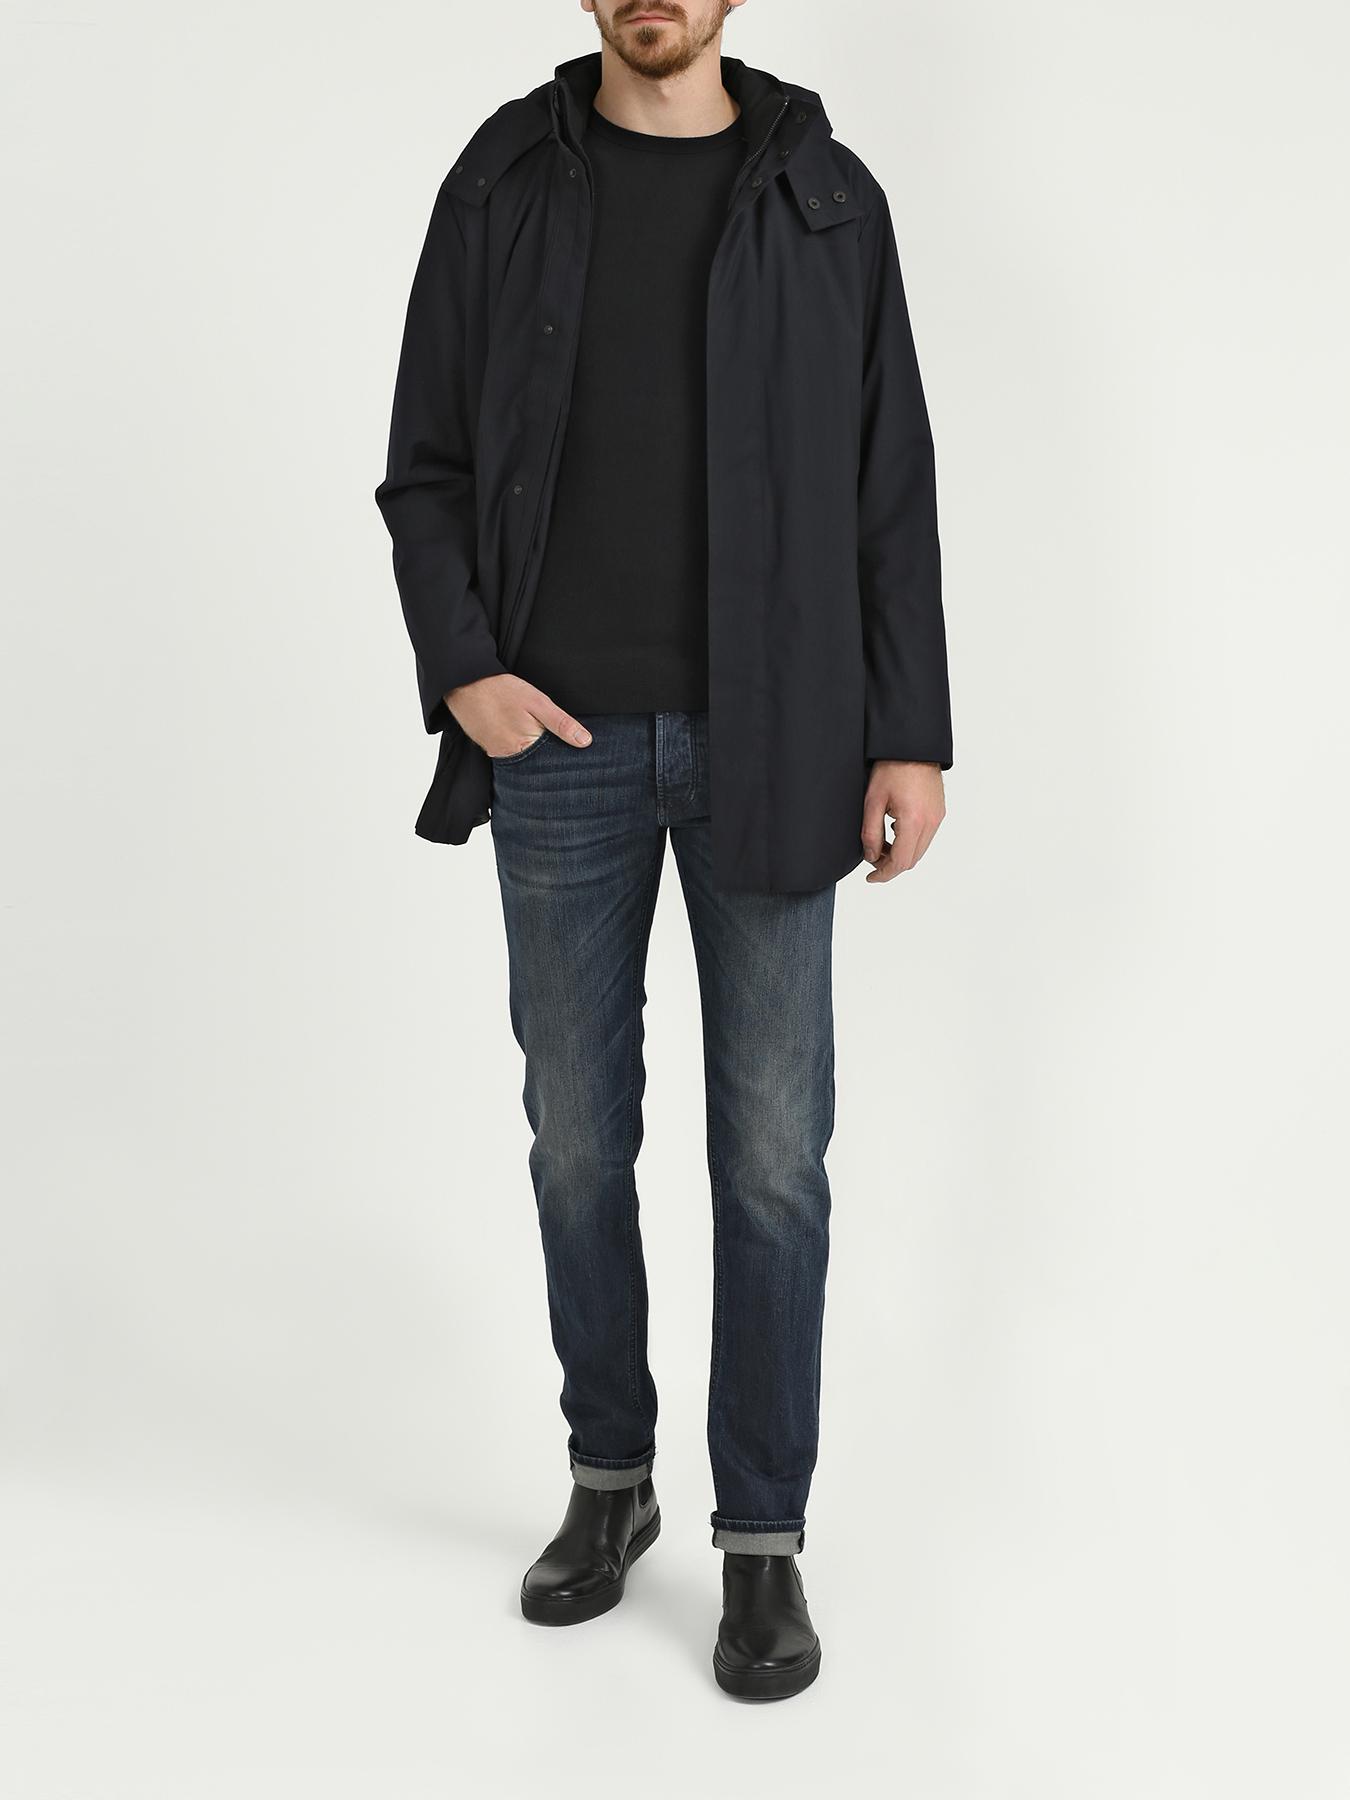 Пальто Emporio Armani Мужская куртка пальто emporio armani черный